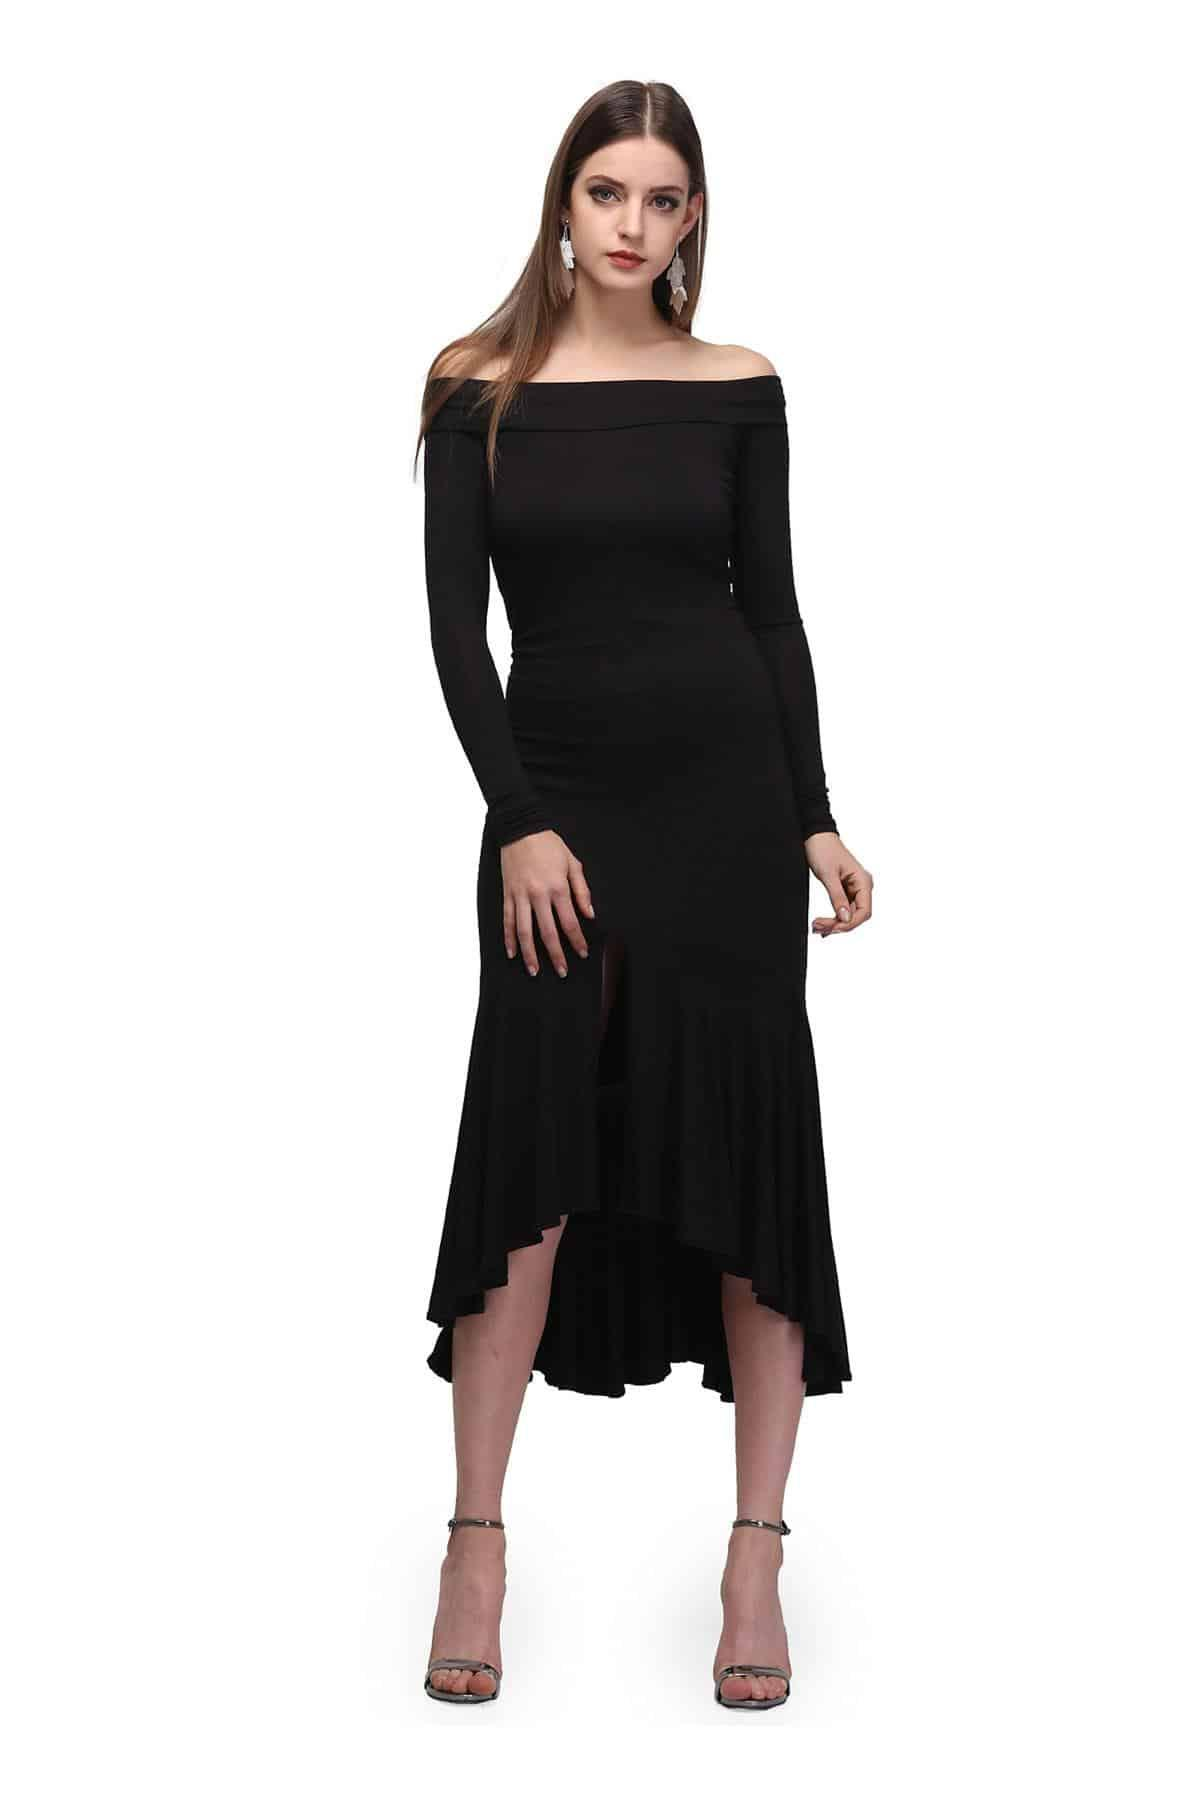 15c236231d8 Black Black Off shoulder Midi Dress by Sudeshna Urban for rent ...